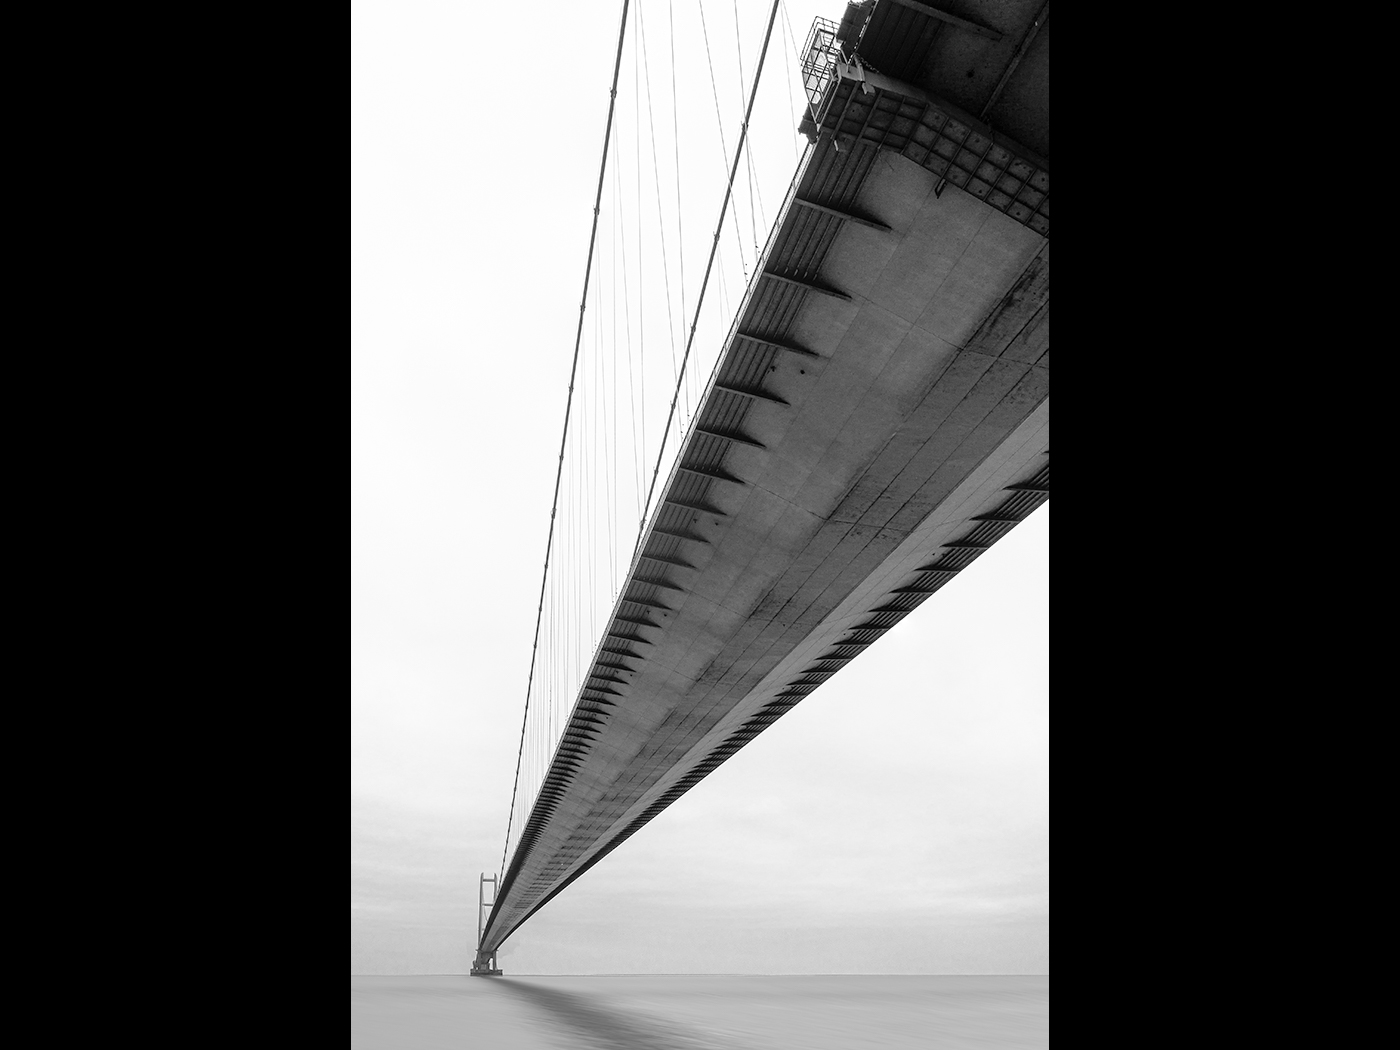 Humber Bridge Lines